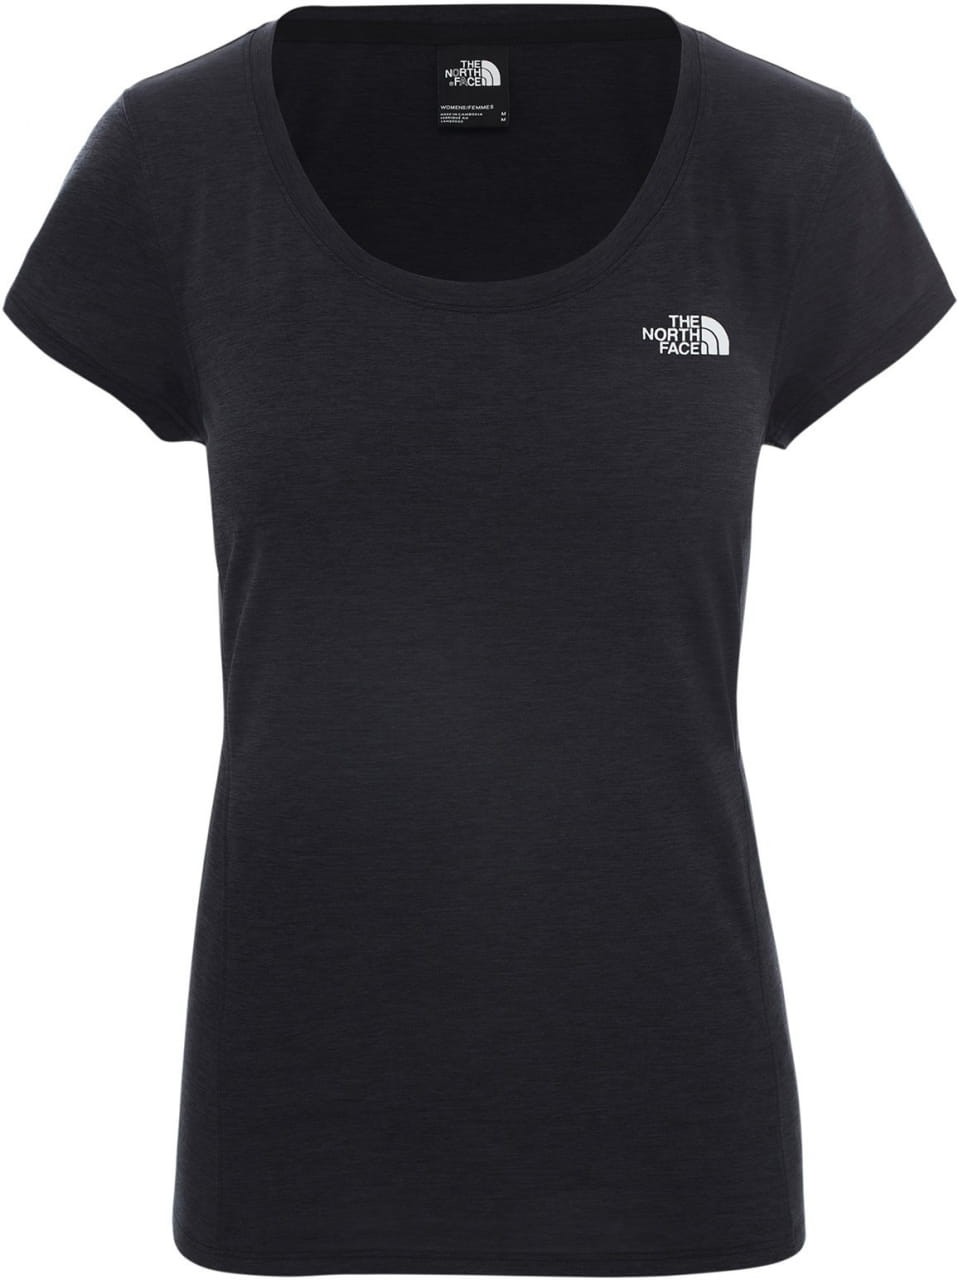 T-Shirts The North Face Women's Hikestelller II T-Shirt